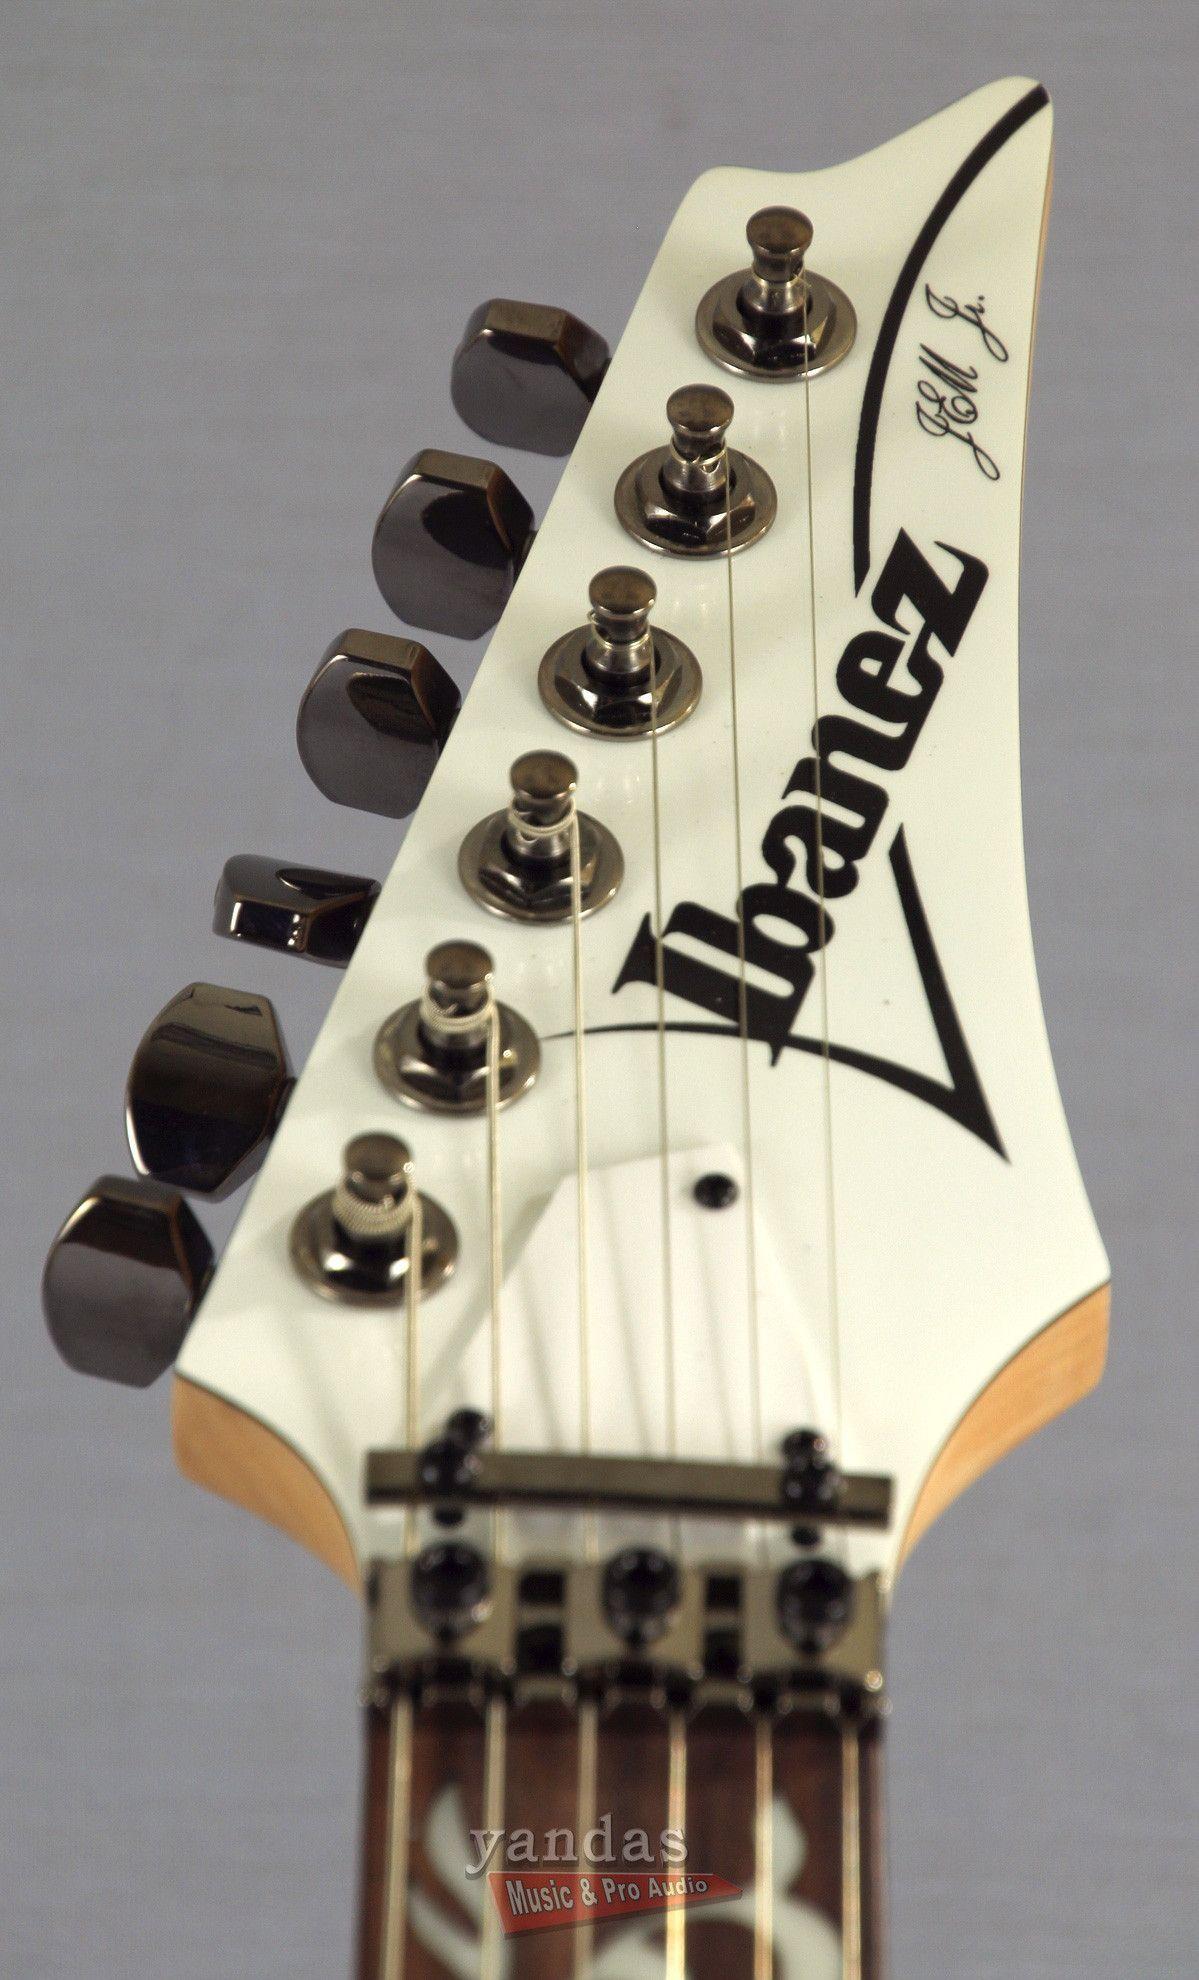 Ibanez Jem Jr Steve Vai Signature Electric Guitar Guitarist Of Tokairegistrycom View Topic Les Paul Vintage Modern Wiring